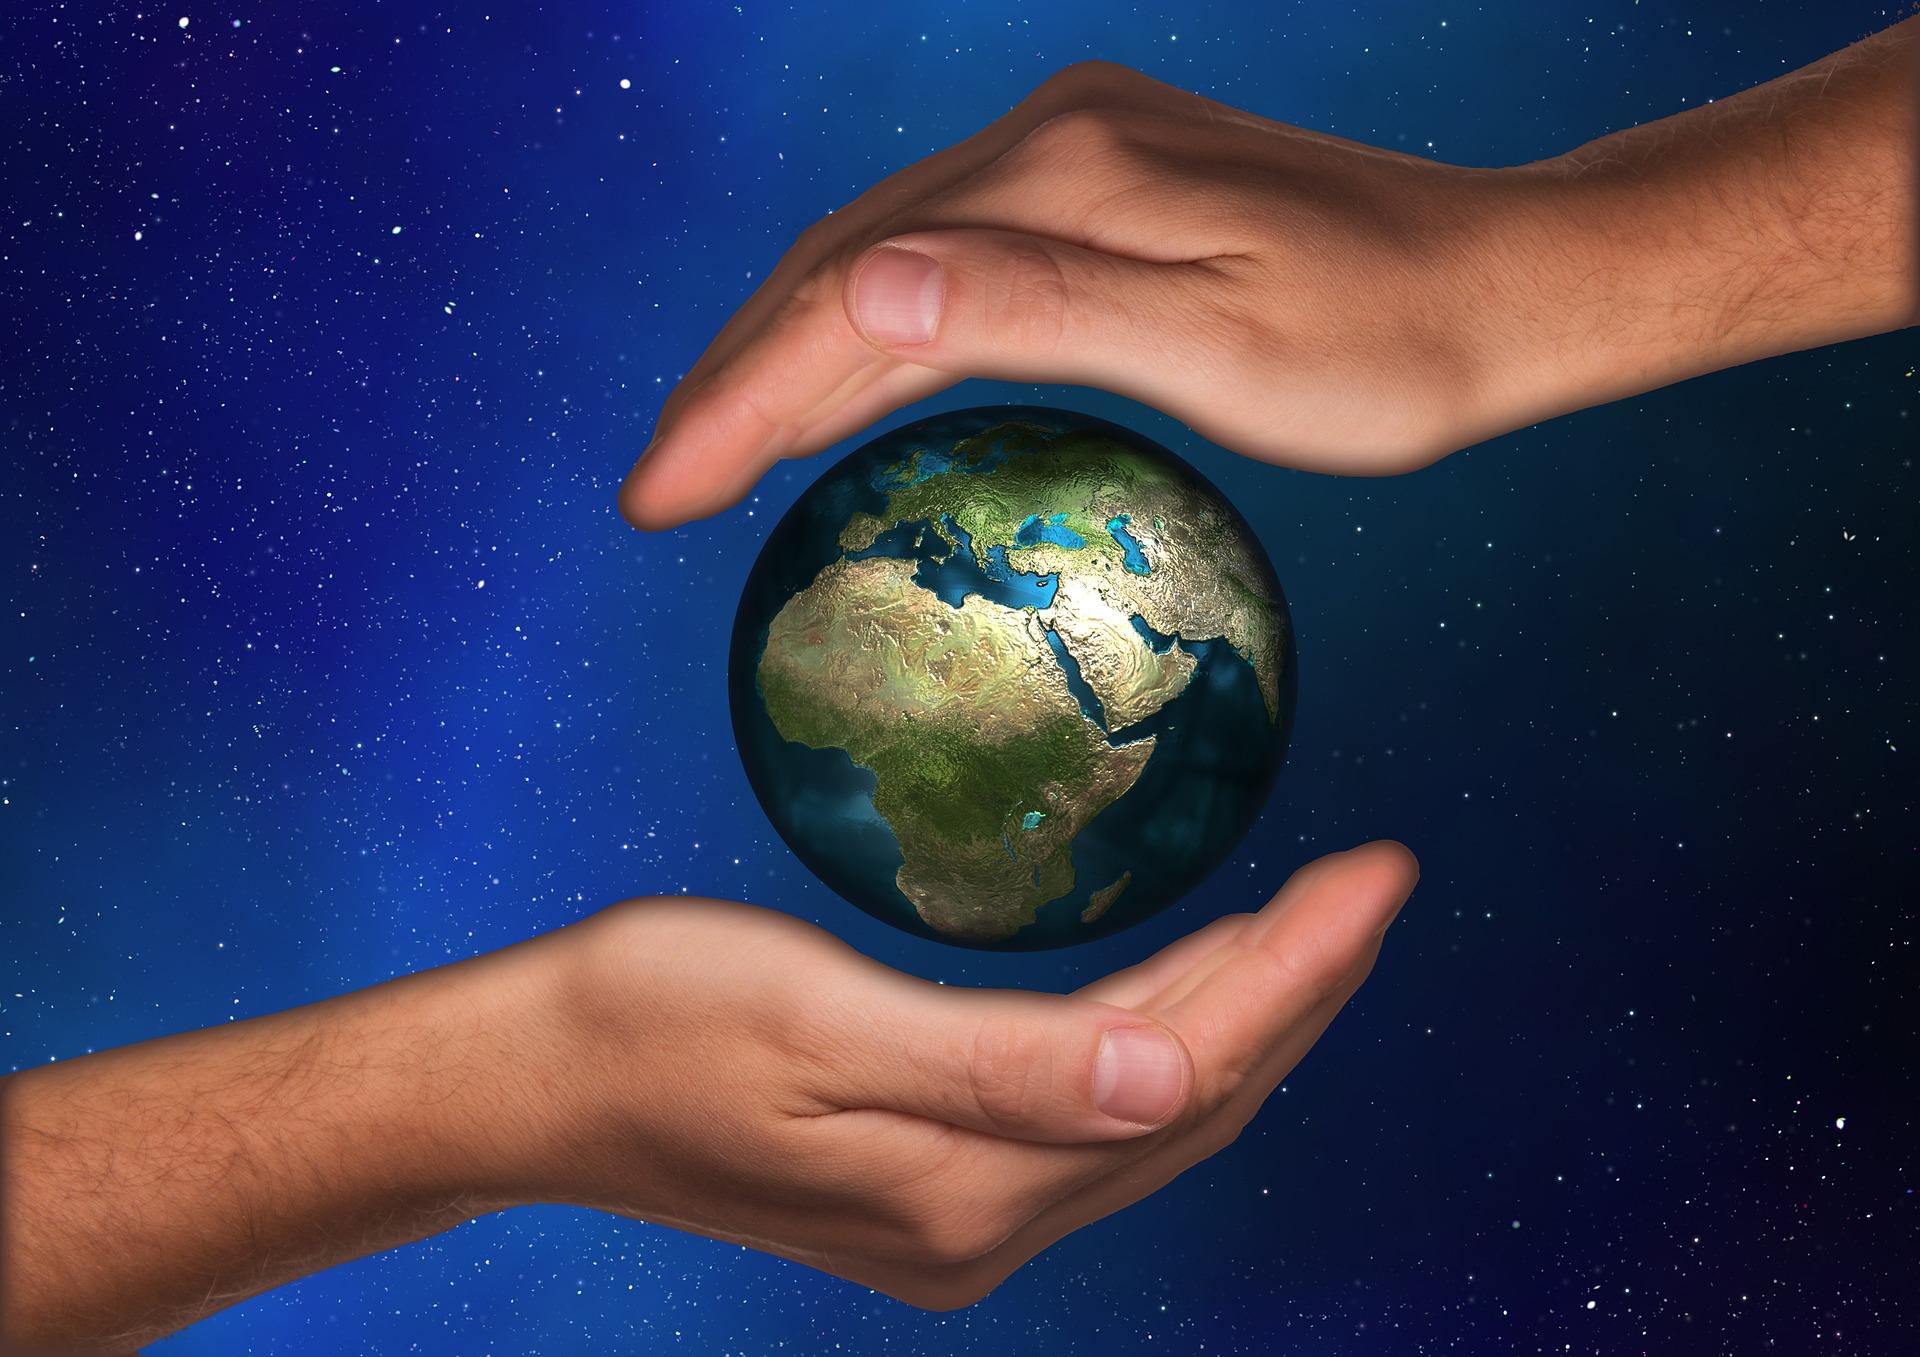 Global-unity-peace